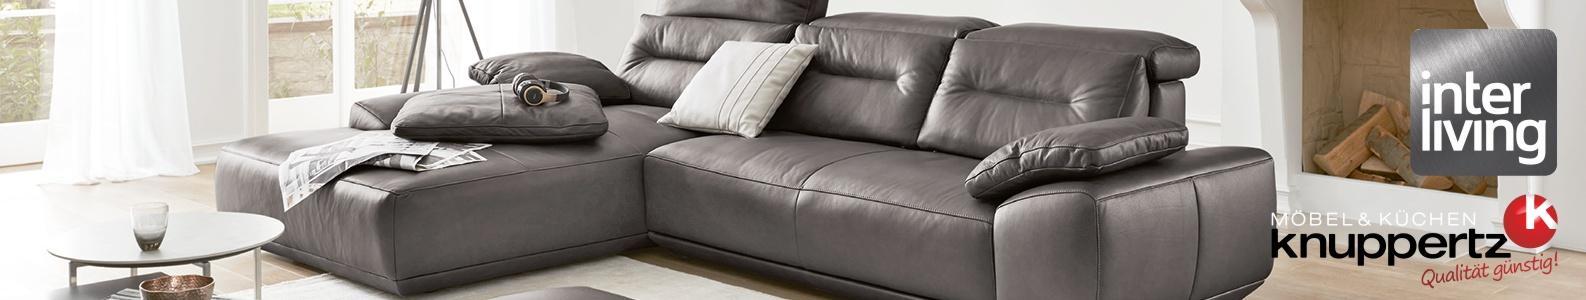 hjort knudsen danish design relaxsessel sessel schwarz nussbaum neu 1001. Black Bedroom Furniture Sets. Home Design Ideas